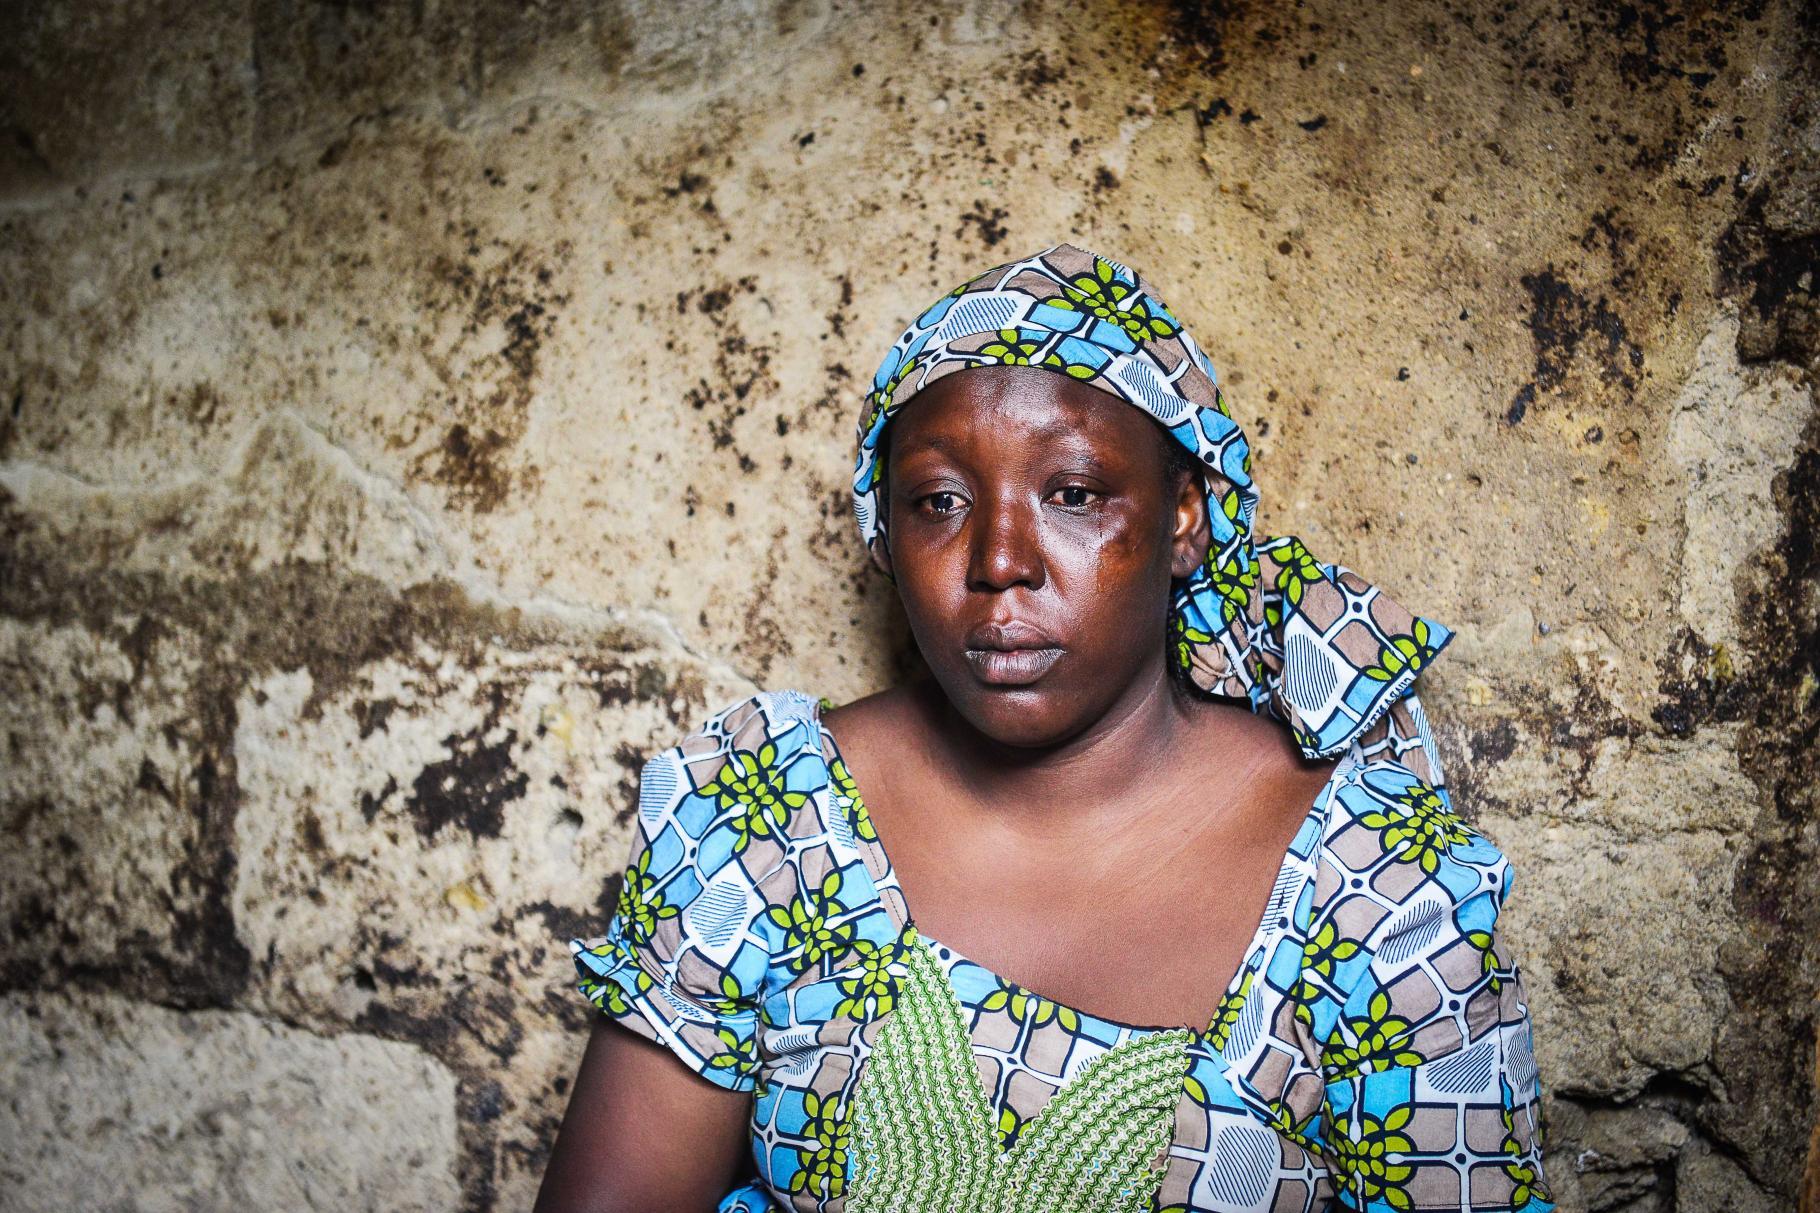 Nigeria for Oxfam spenden